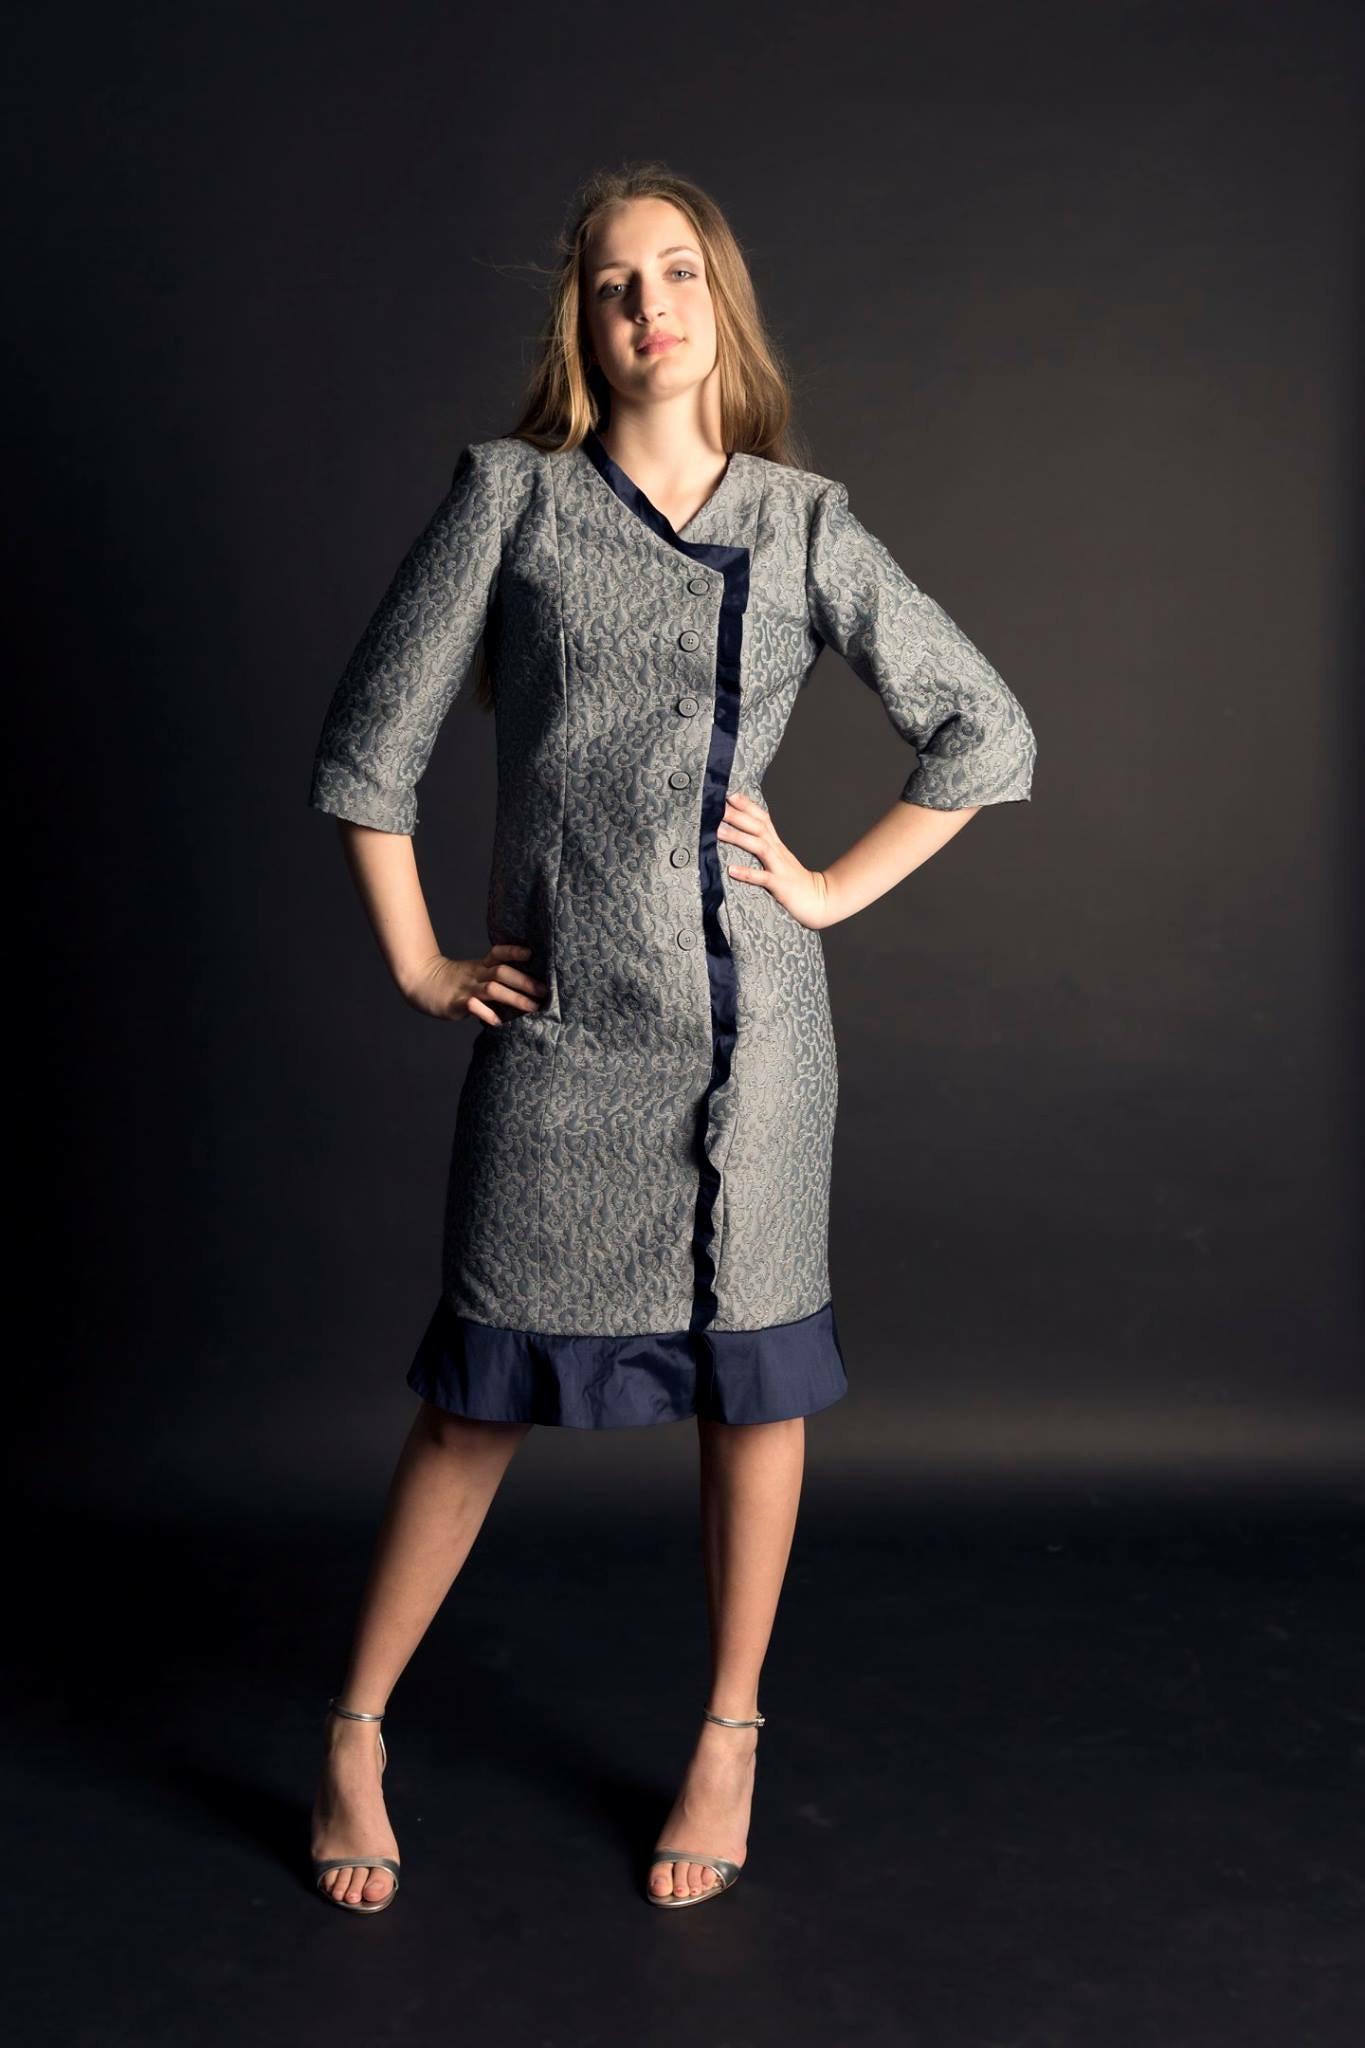 Alterations - Daywear / General